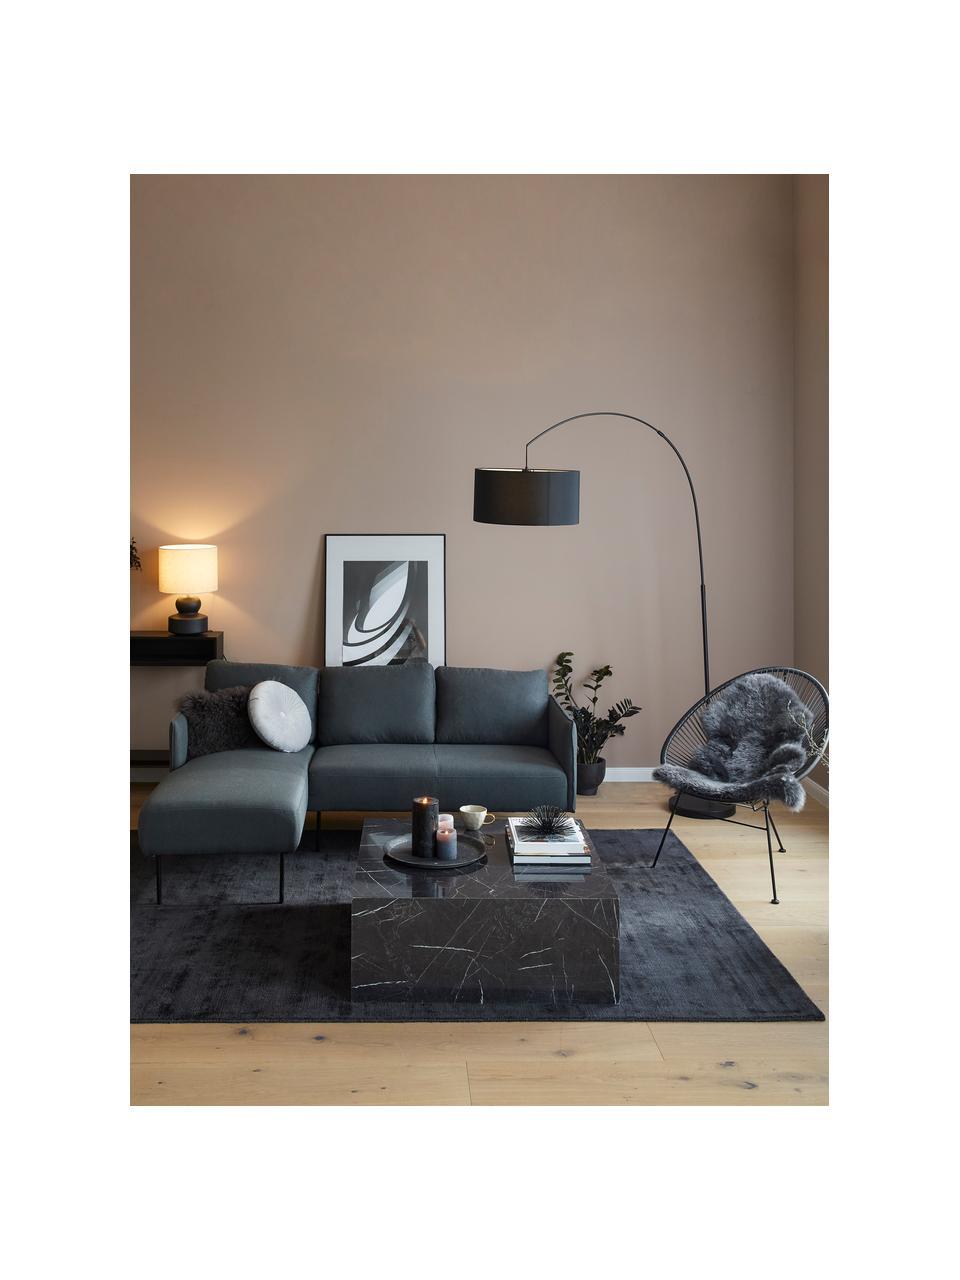 Loungesessel Bahia aus Kunststoff-Geflecht, Sitzfläche: Kunststoff, Gestell: Metall, pulverbeschichtet, Grau, B 81 x T 73 cm